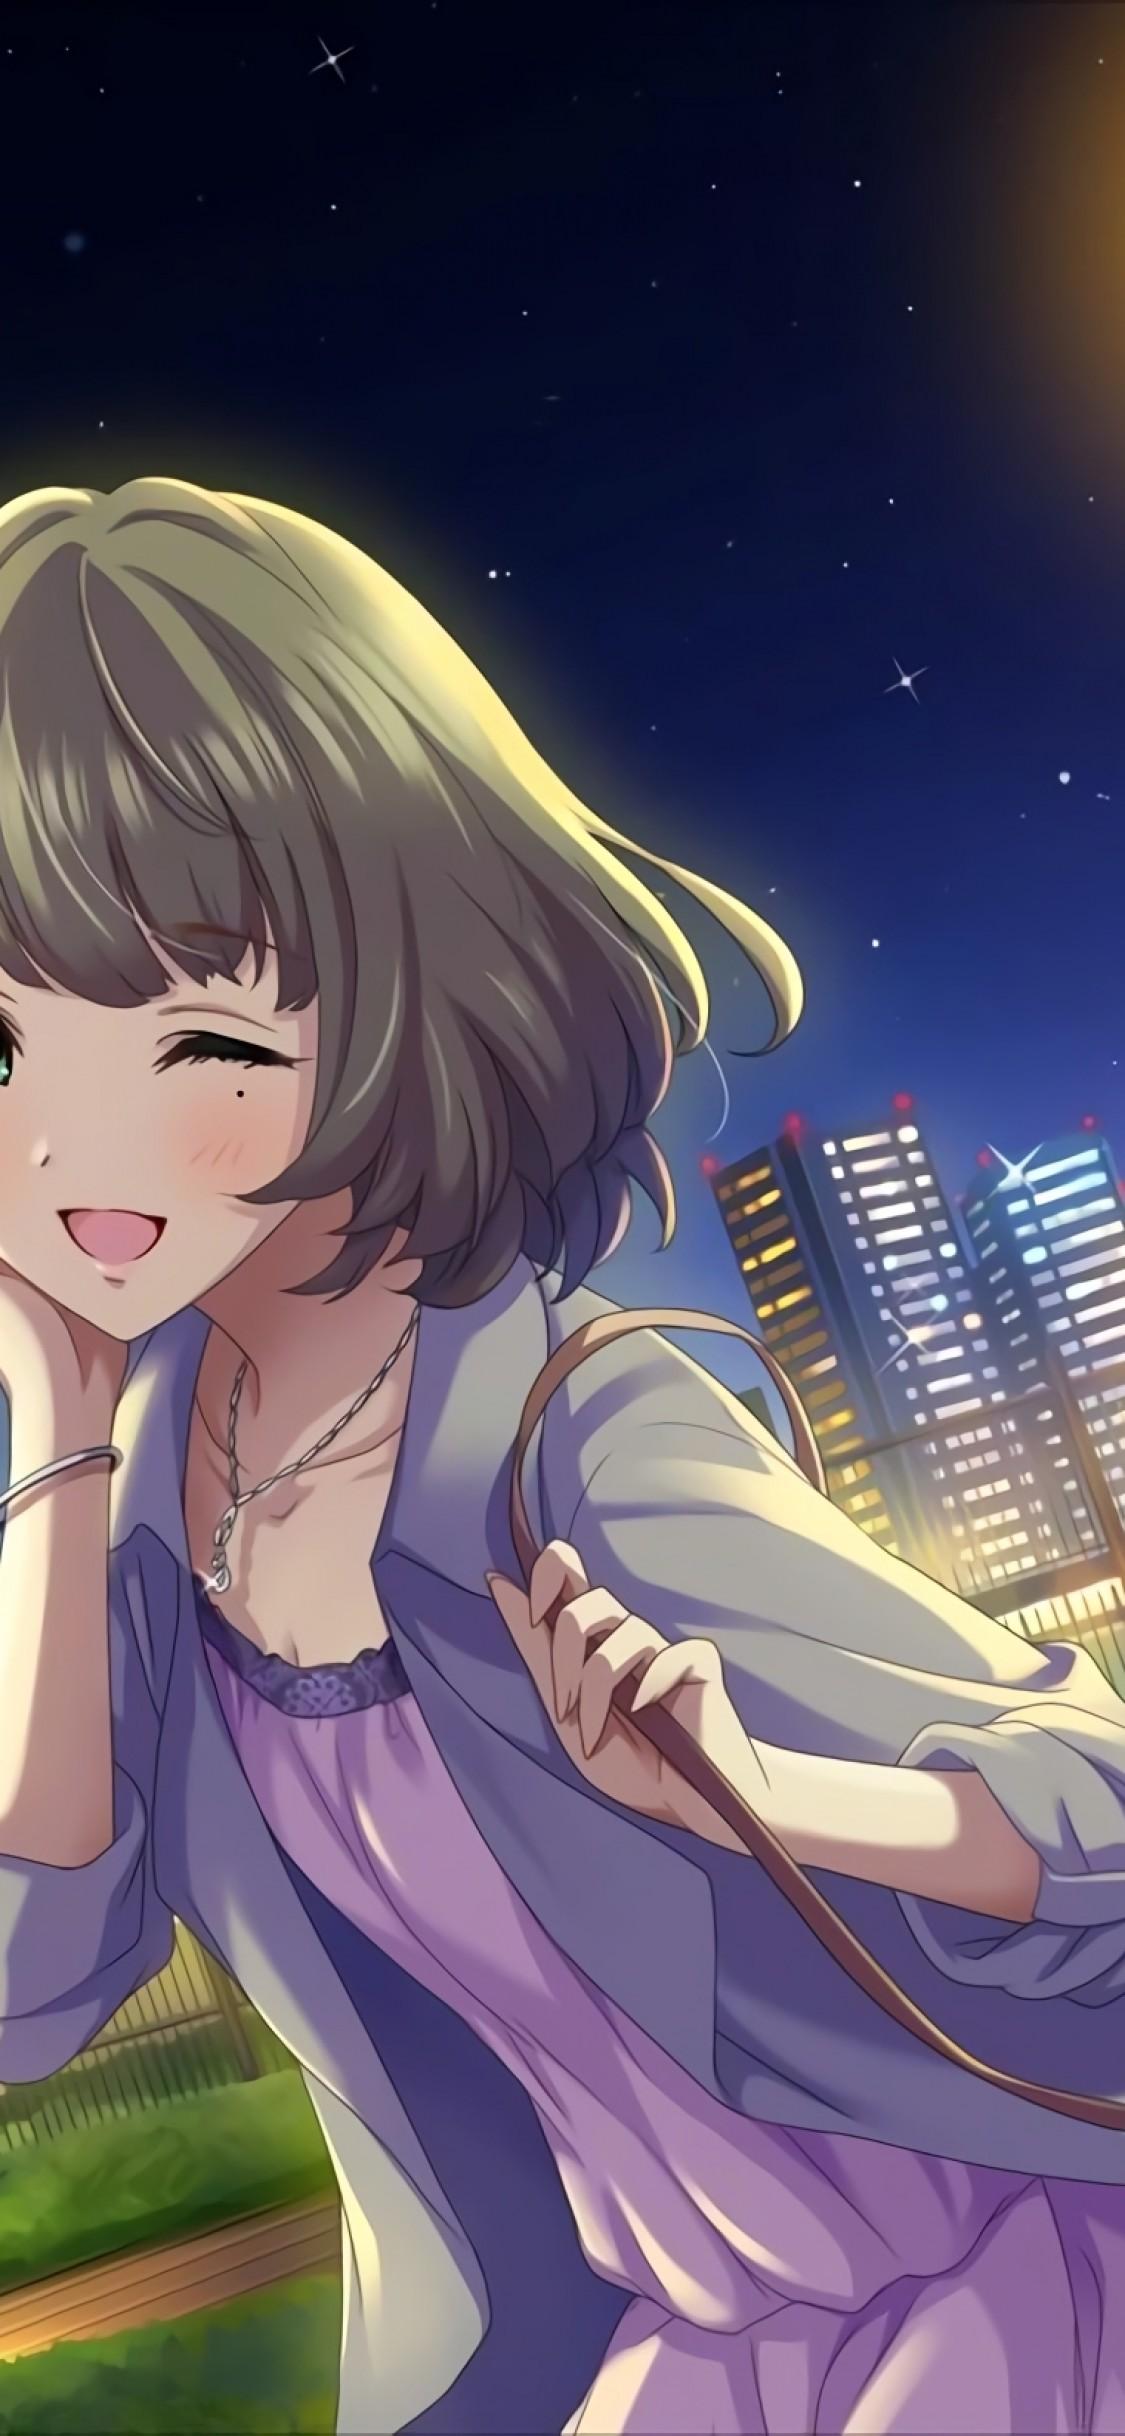 Anime Girl Phone Wallpaper صور انمي خلفيات رائعة لهواتف الآيفون Iphone X Anime عالم